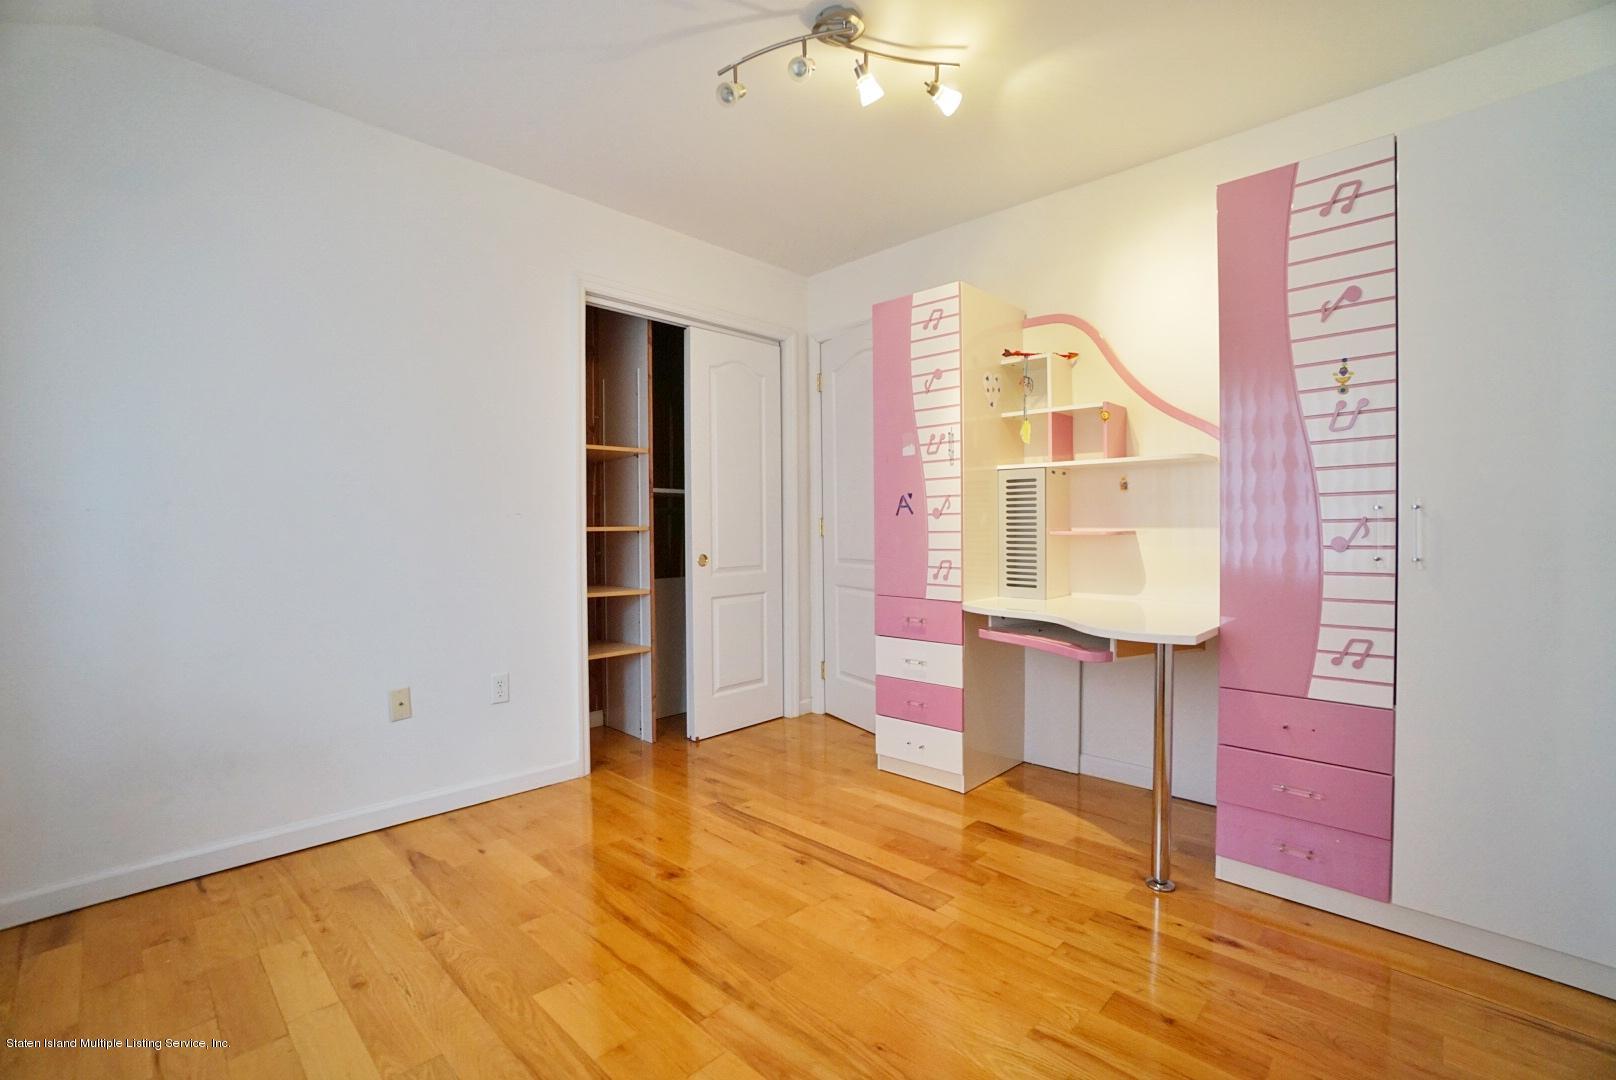 Single Family - Detached 311 Norway Avenue  Staten Island, NY 10305, MLS-1132870-19